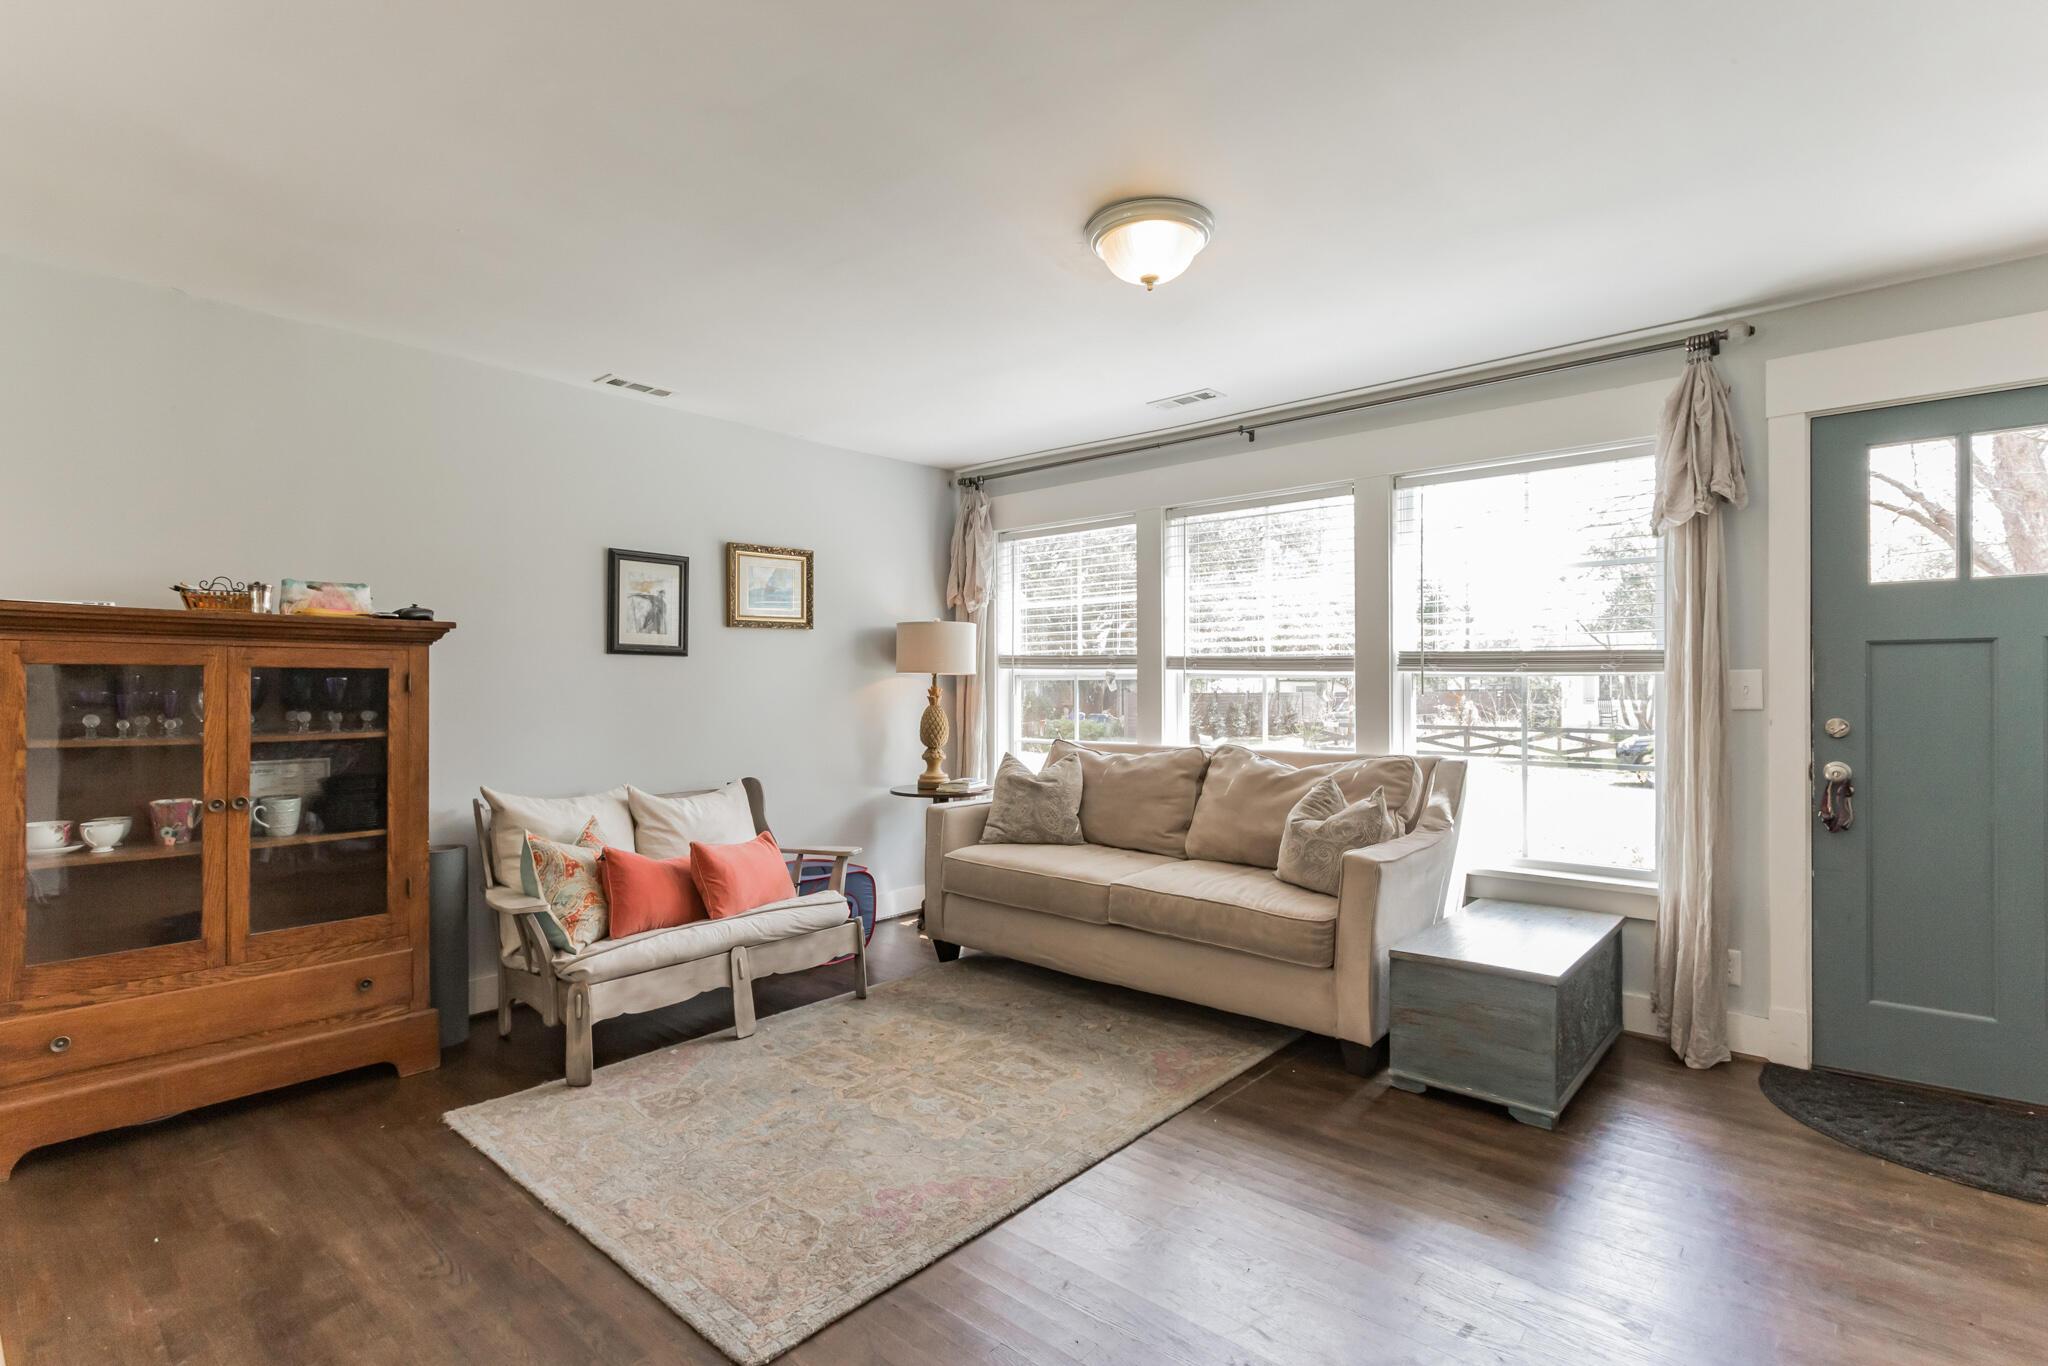 Stafford Heights Homes For Sale - 3472 Cynthia, Johns Island, SC - 8